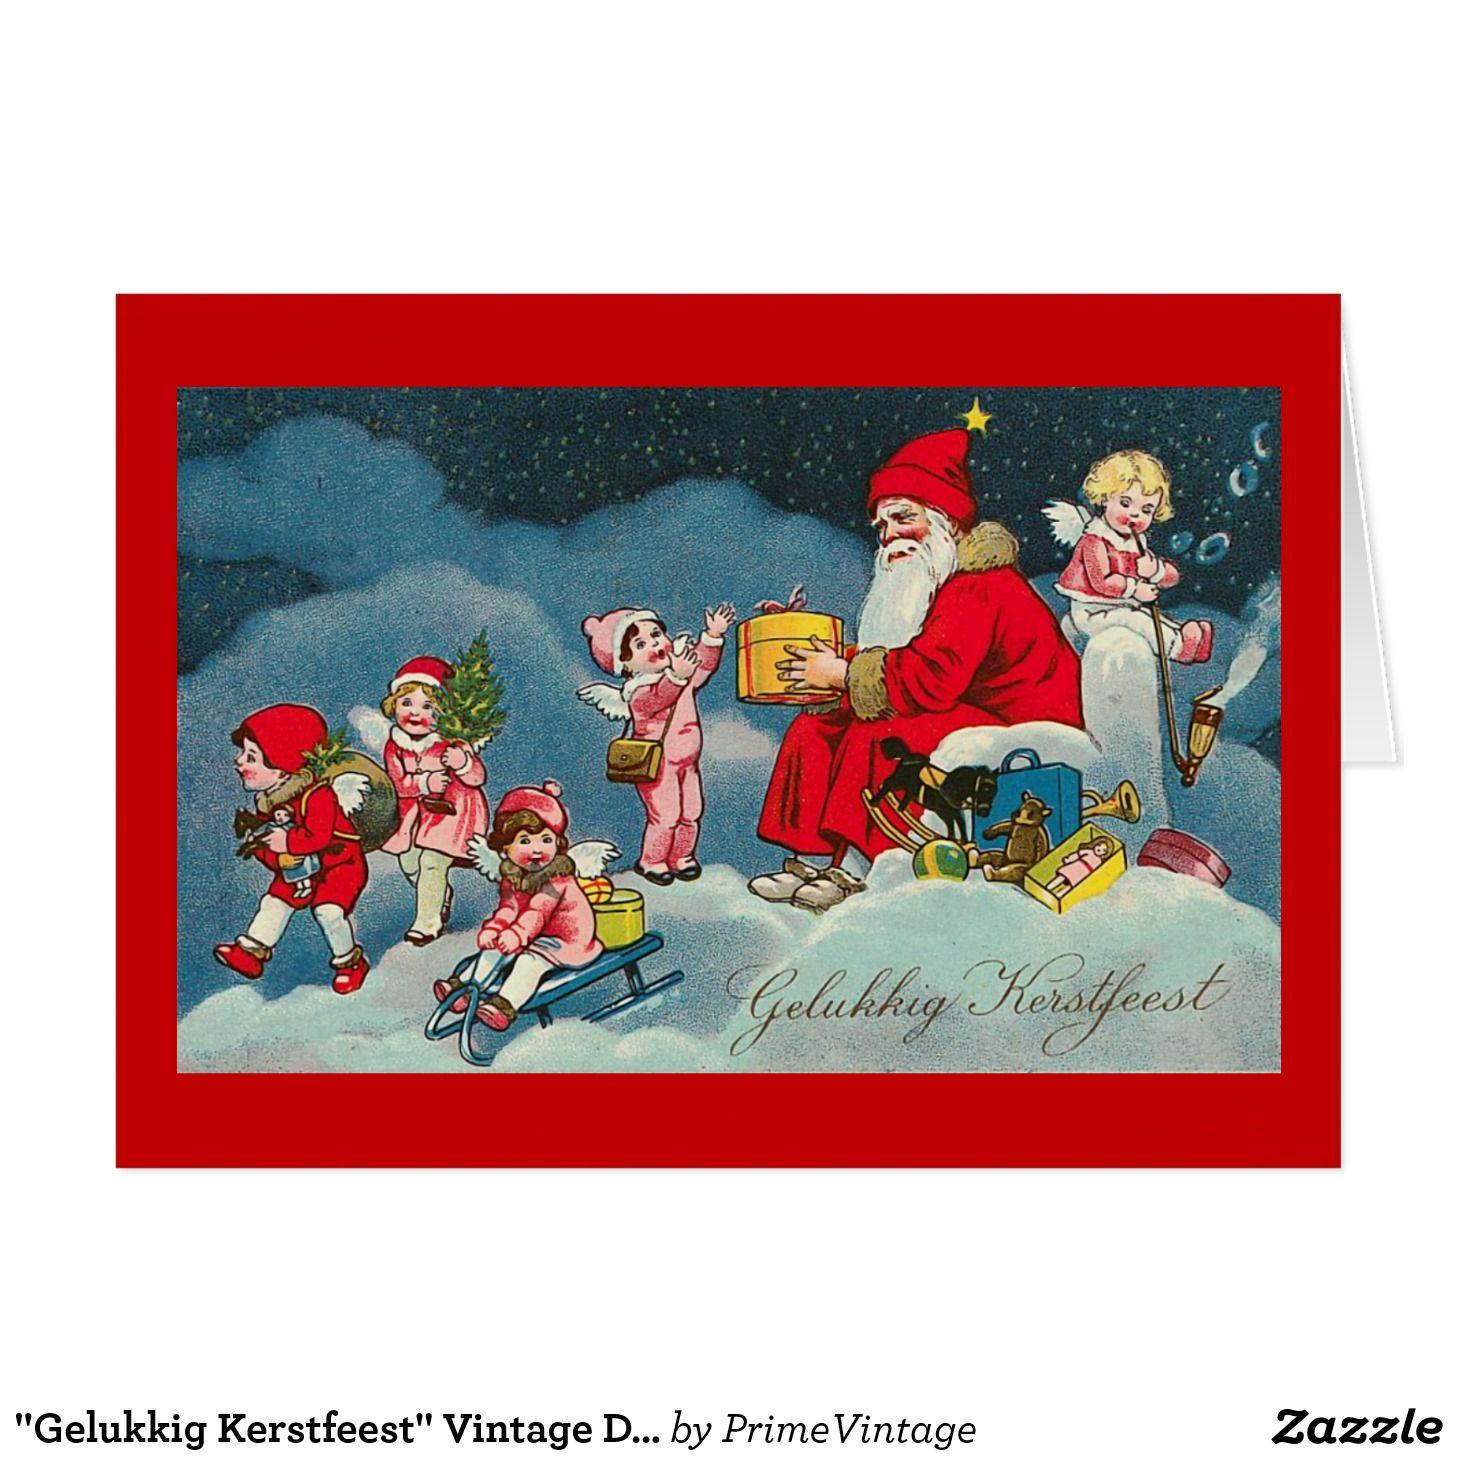 Dutch Christmas.Gelukkig Kerstfeest Vintage Dutch Christmas Card Zazzle